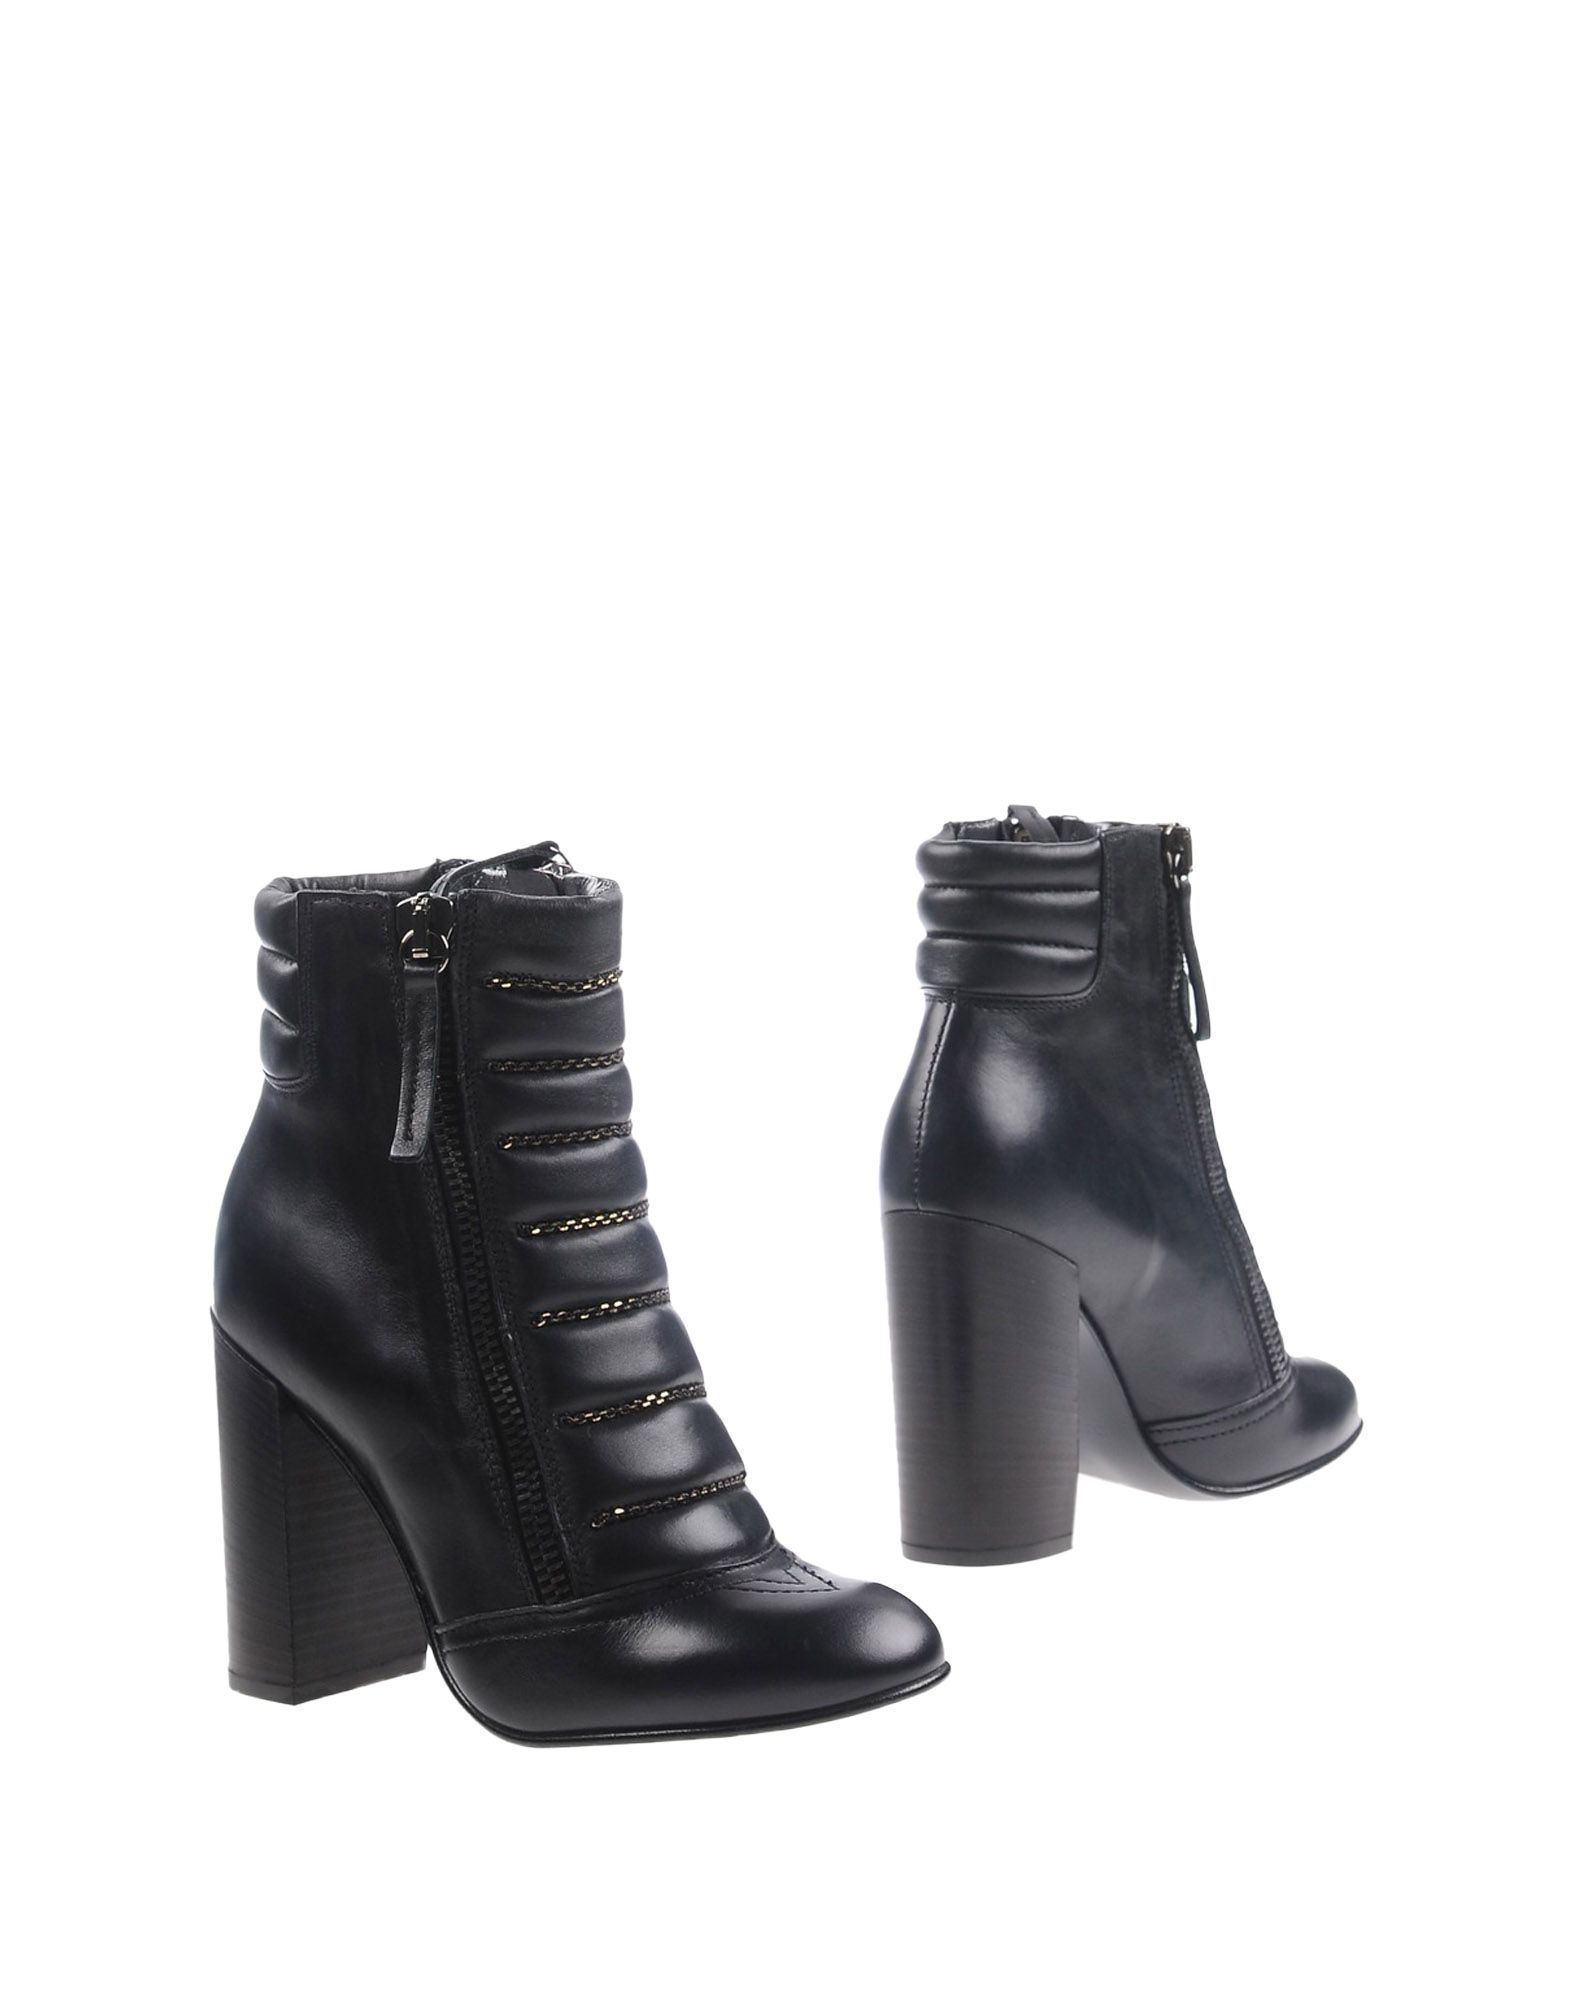 DIESEL BLACK GOLD Полусапоги и высокие ботинки felmini полусапоги felmini 9849 black